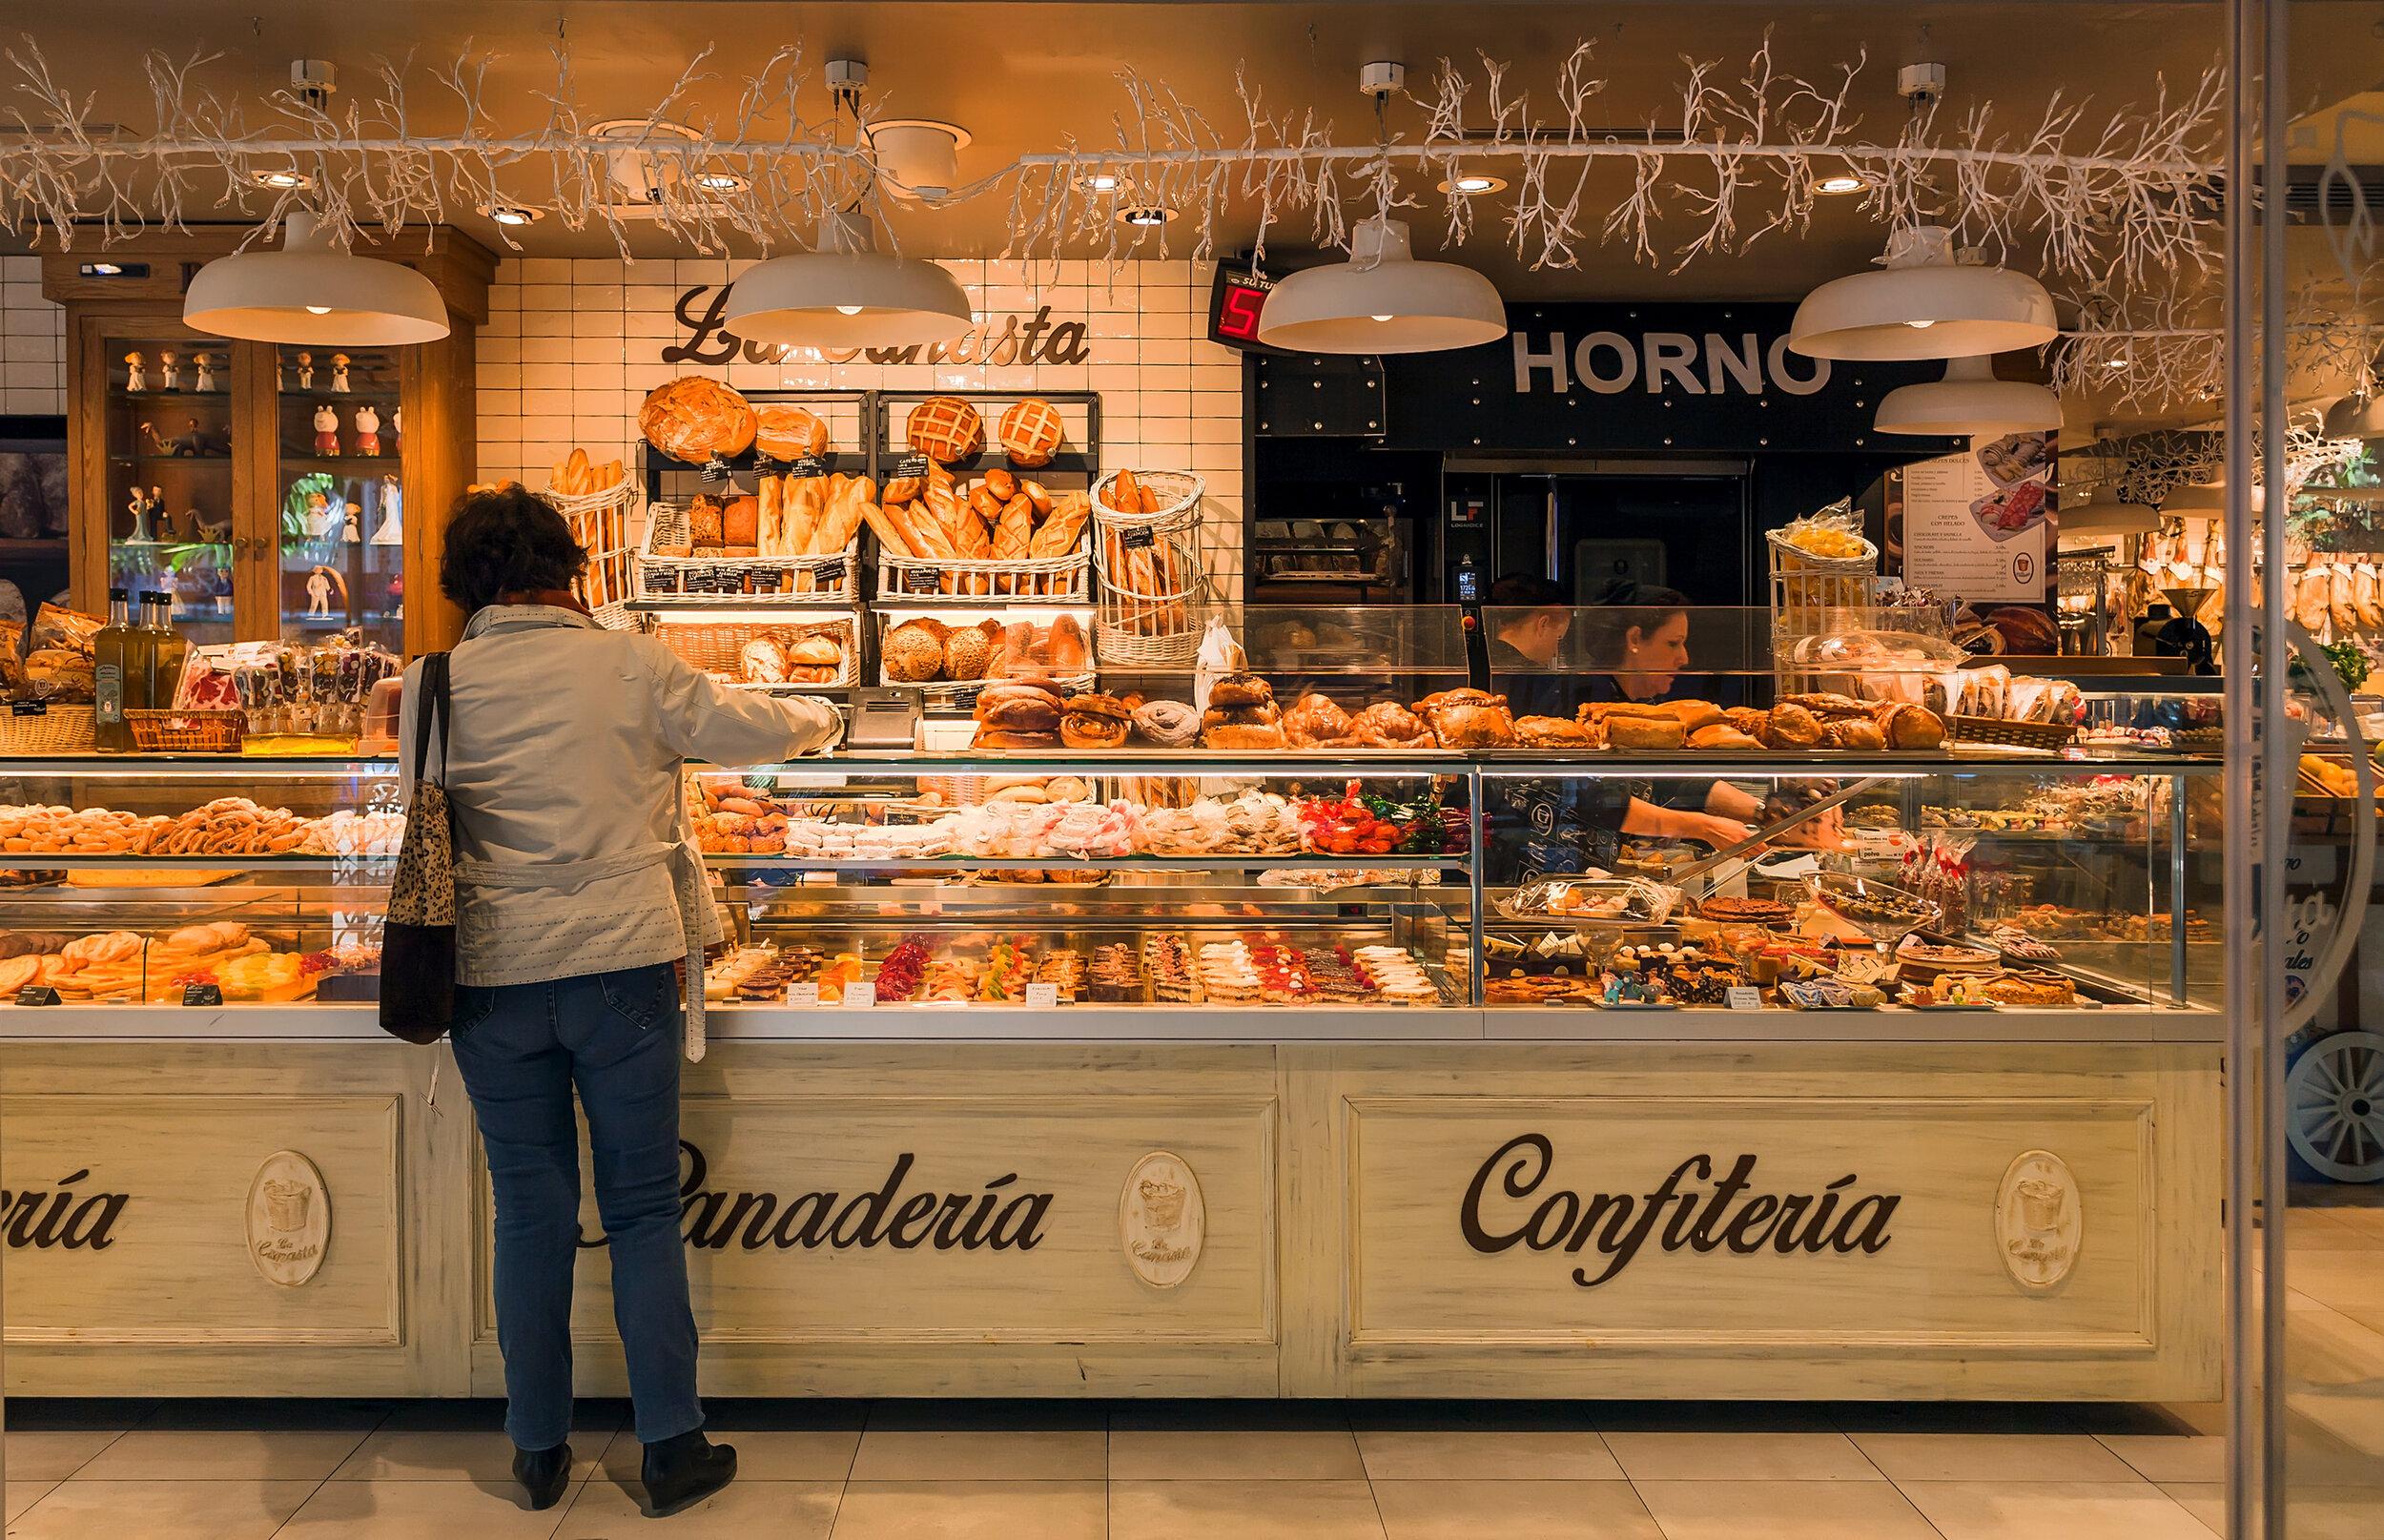 Popular bakery in Malaga